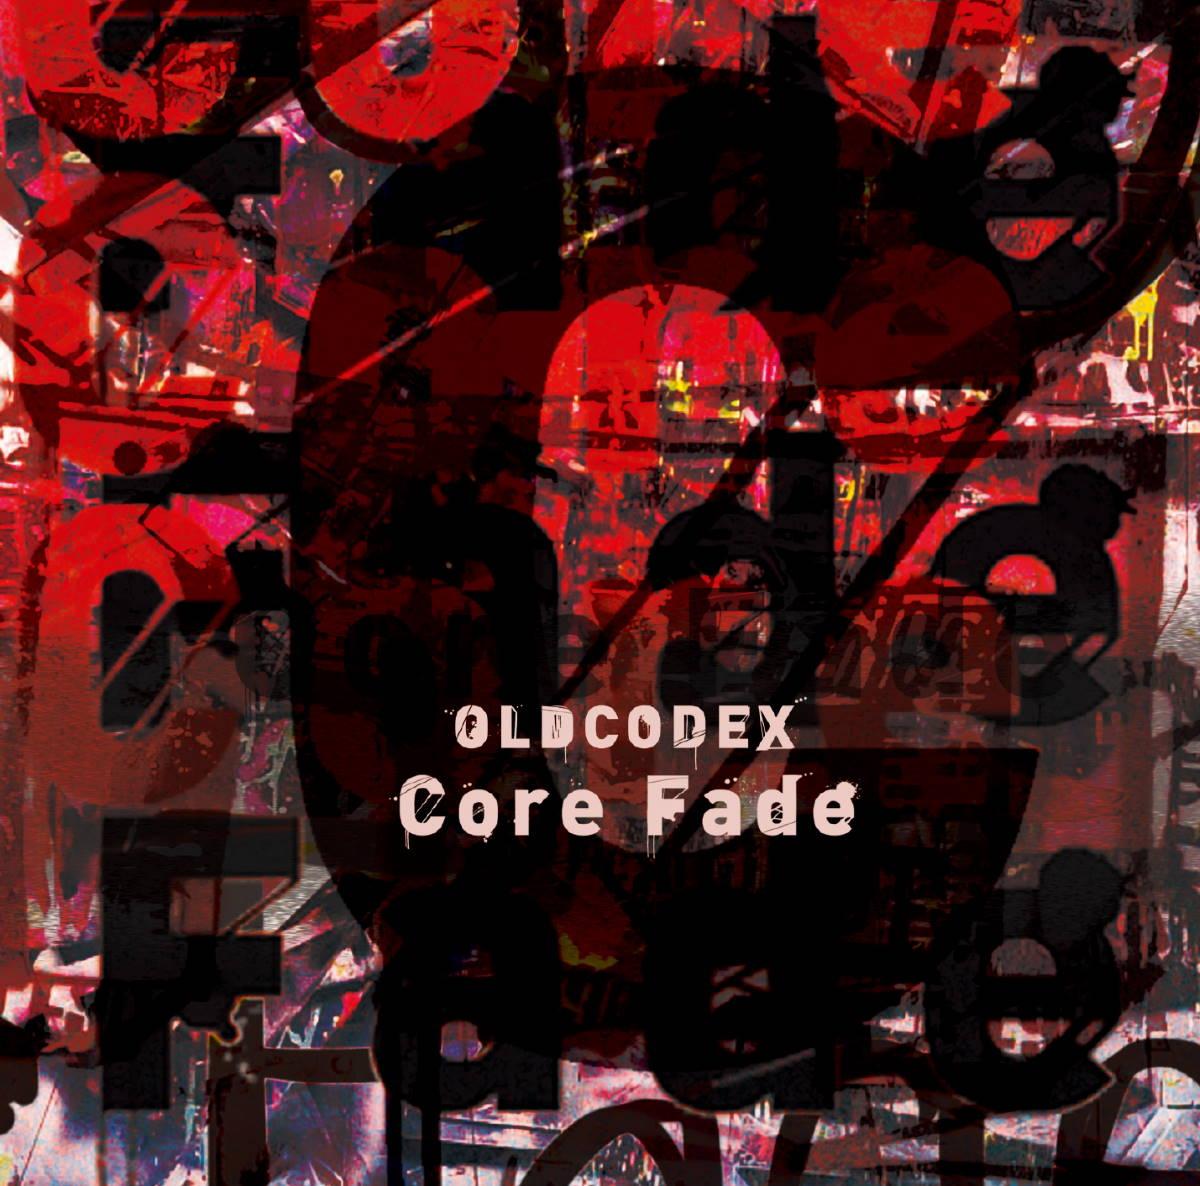 『OLDCODEX - Blow Away』収録の『Core Fade』ジャケット